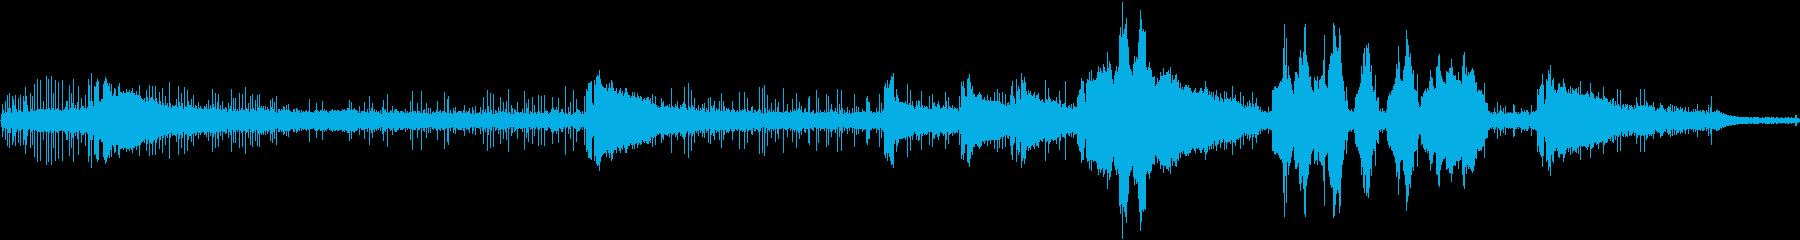 60 Cc Go Cart:スター...の再生済みの波形